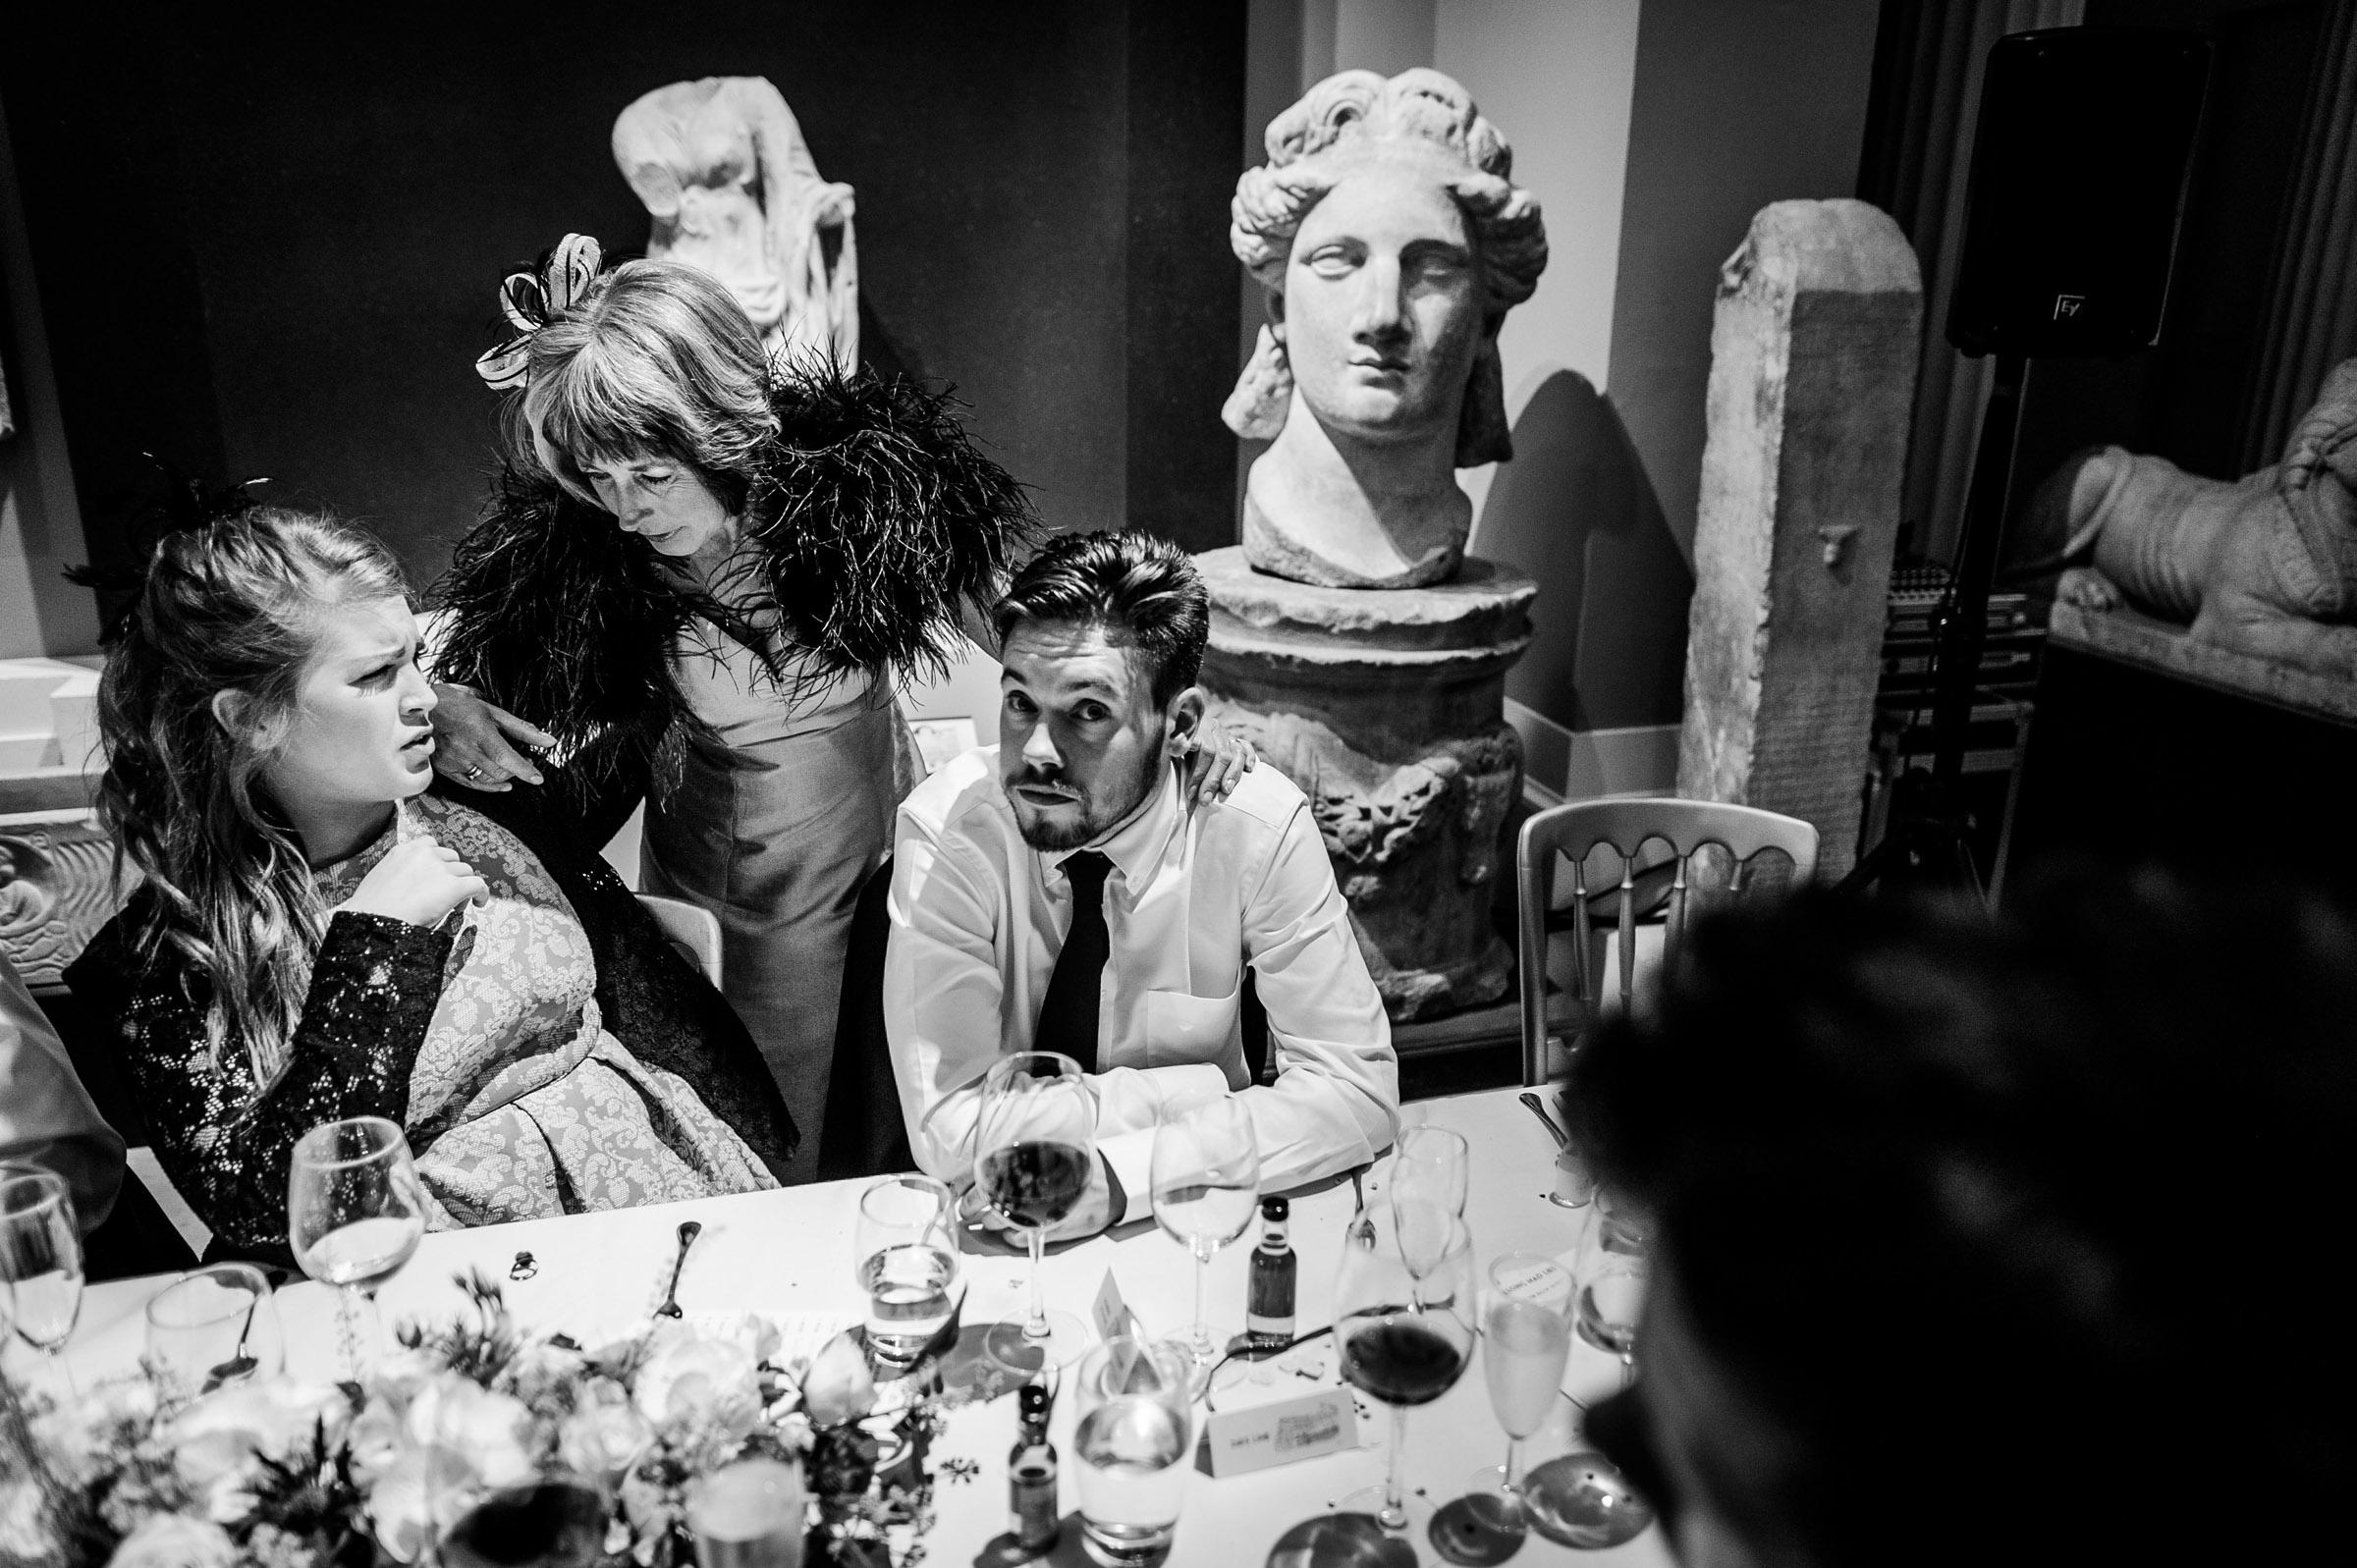 Ashmolean-Museum-Wedding-Pictures-0052.jpg